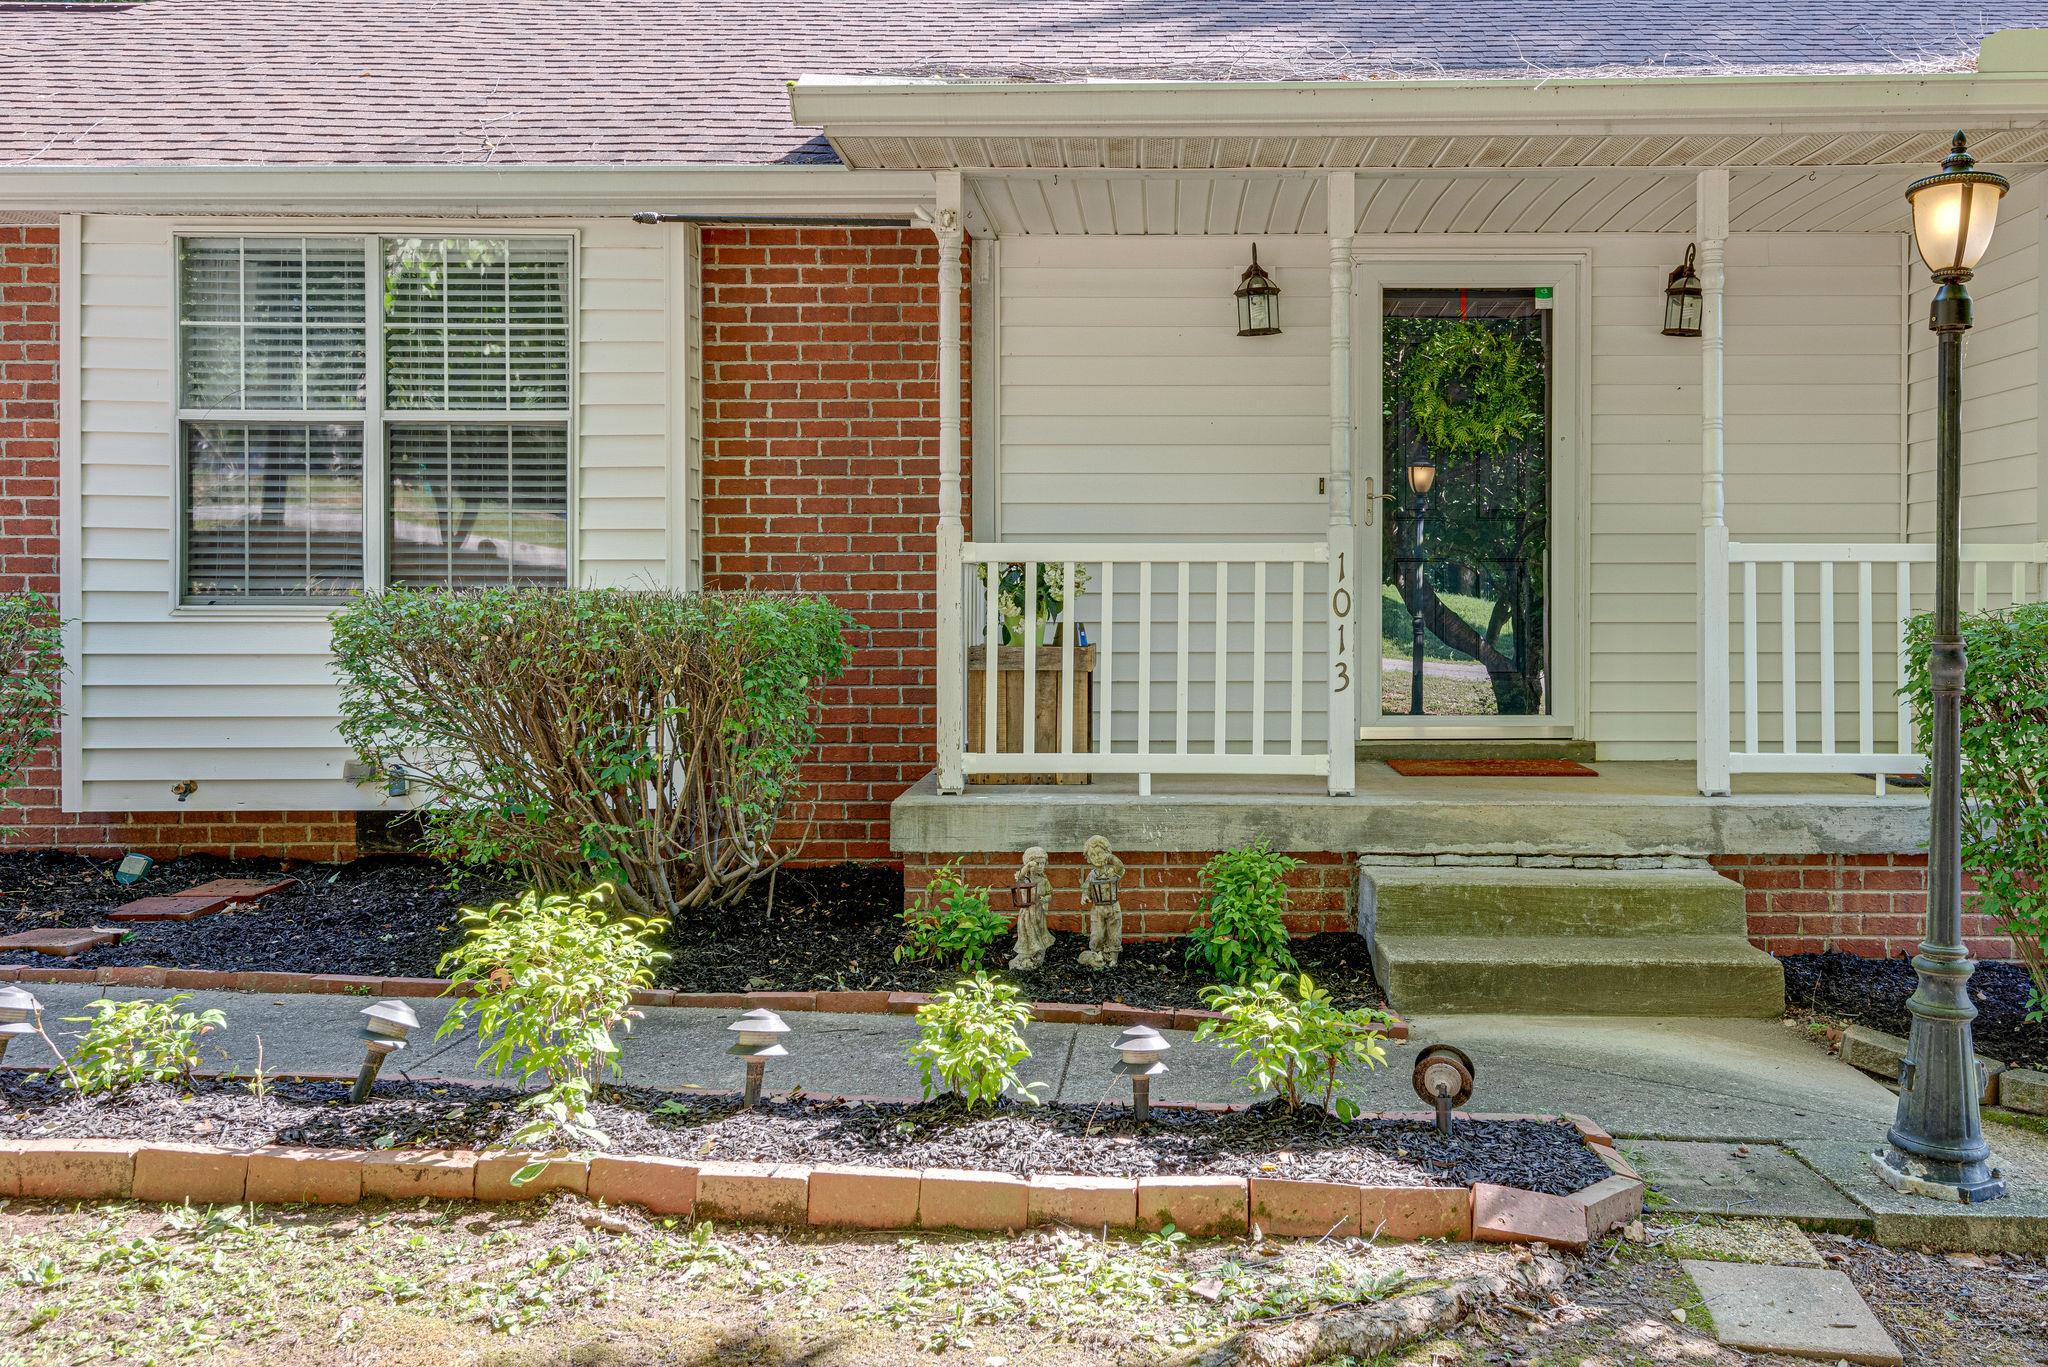 1013 Willowbank Ct, Ashland City, TN 37015 - Ashland City, TN real estate listing